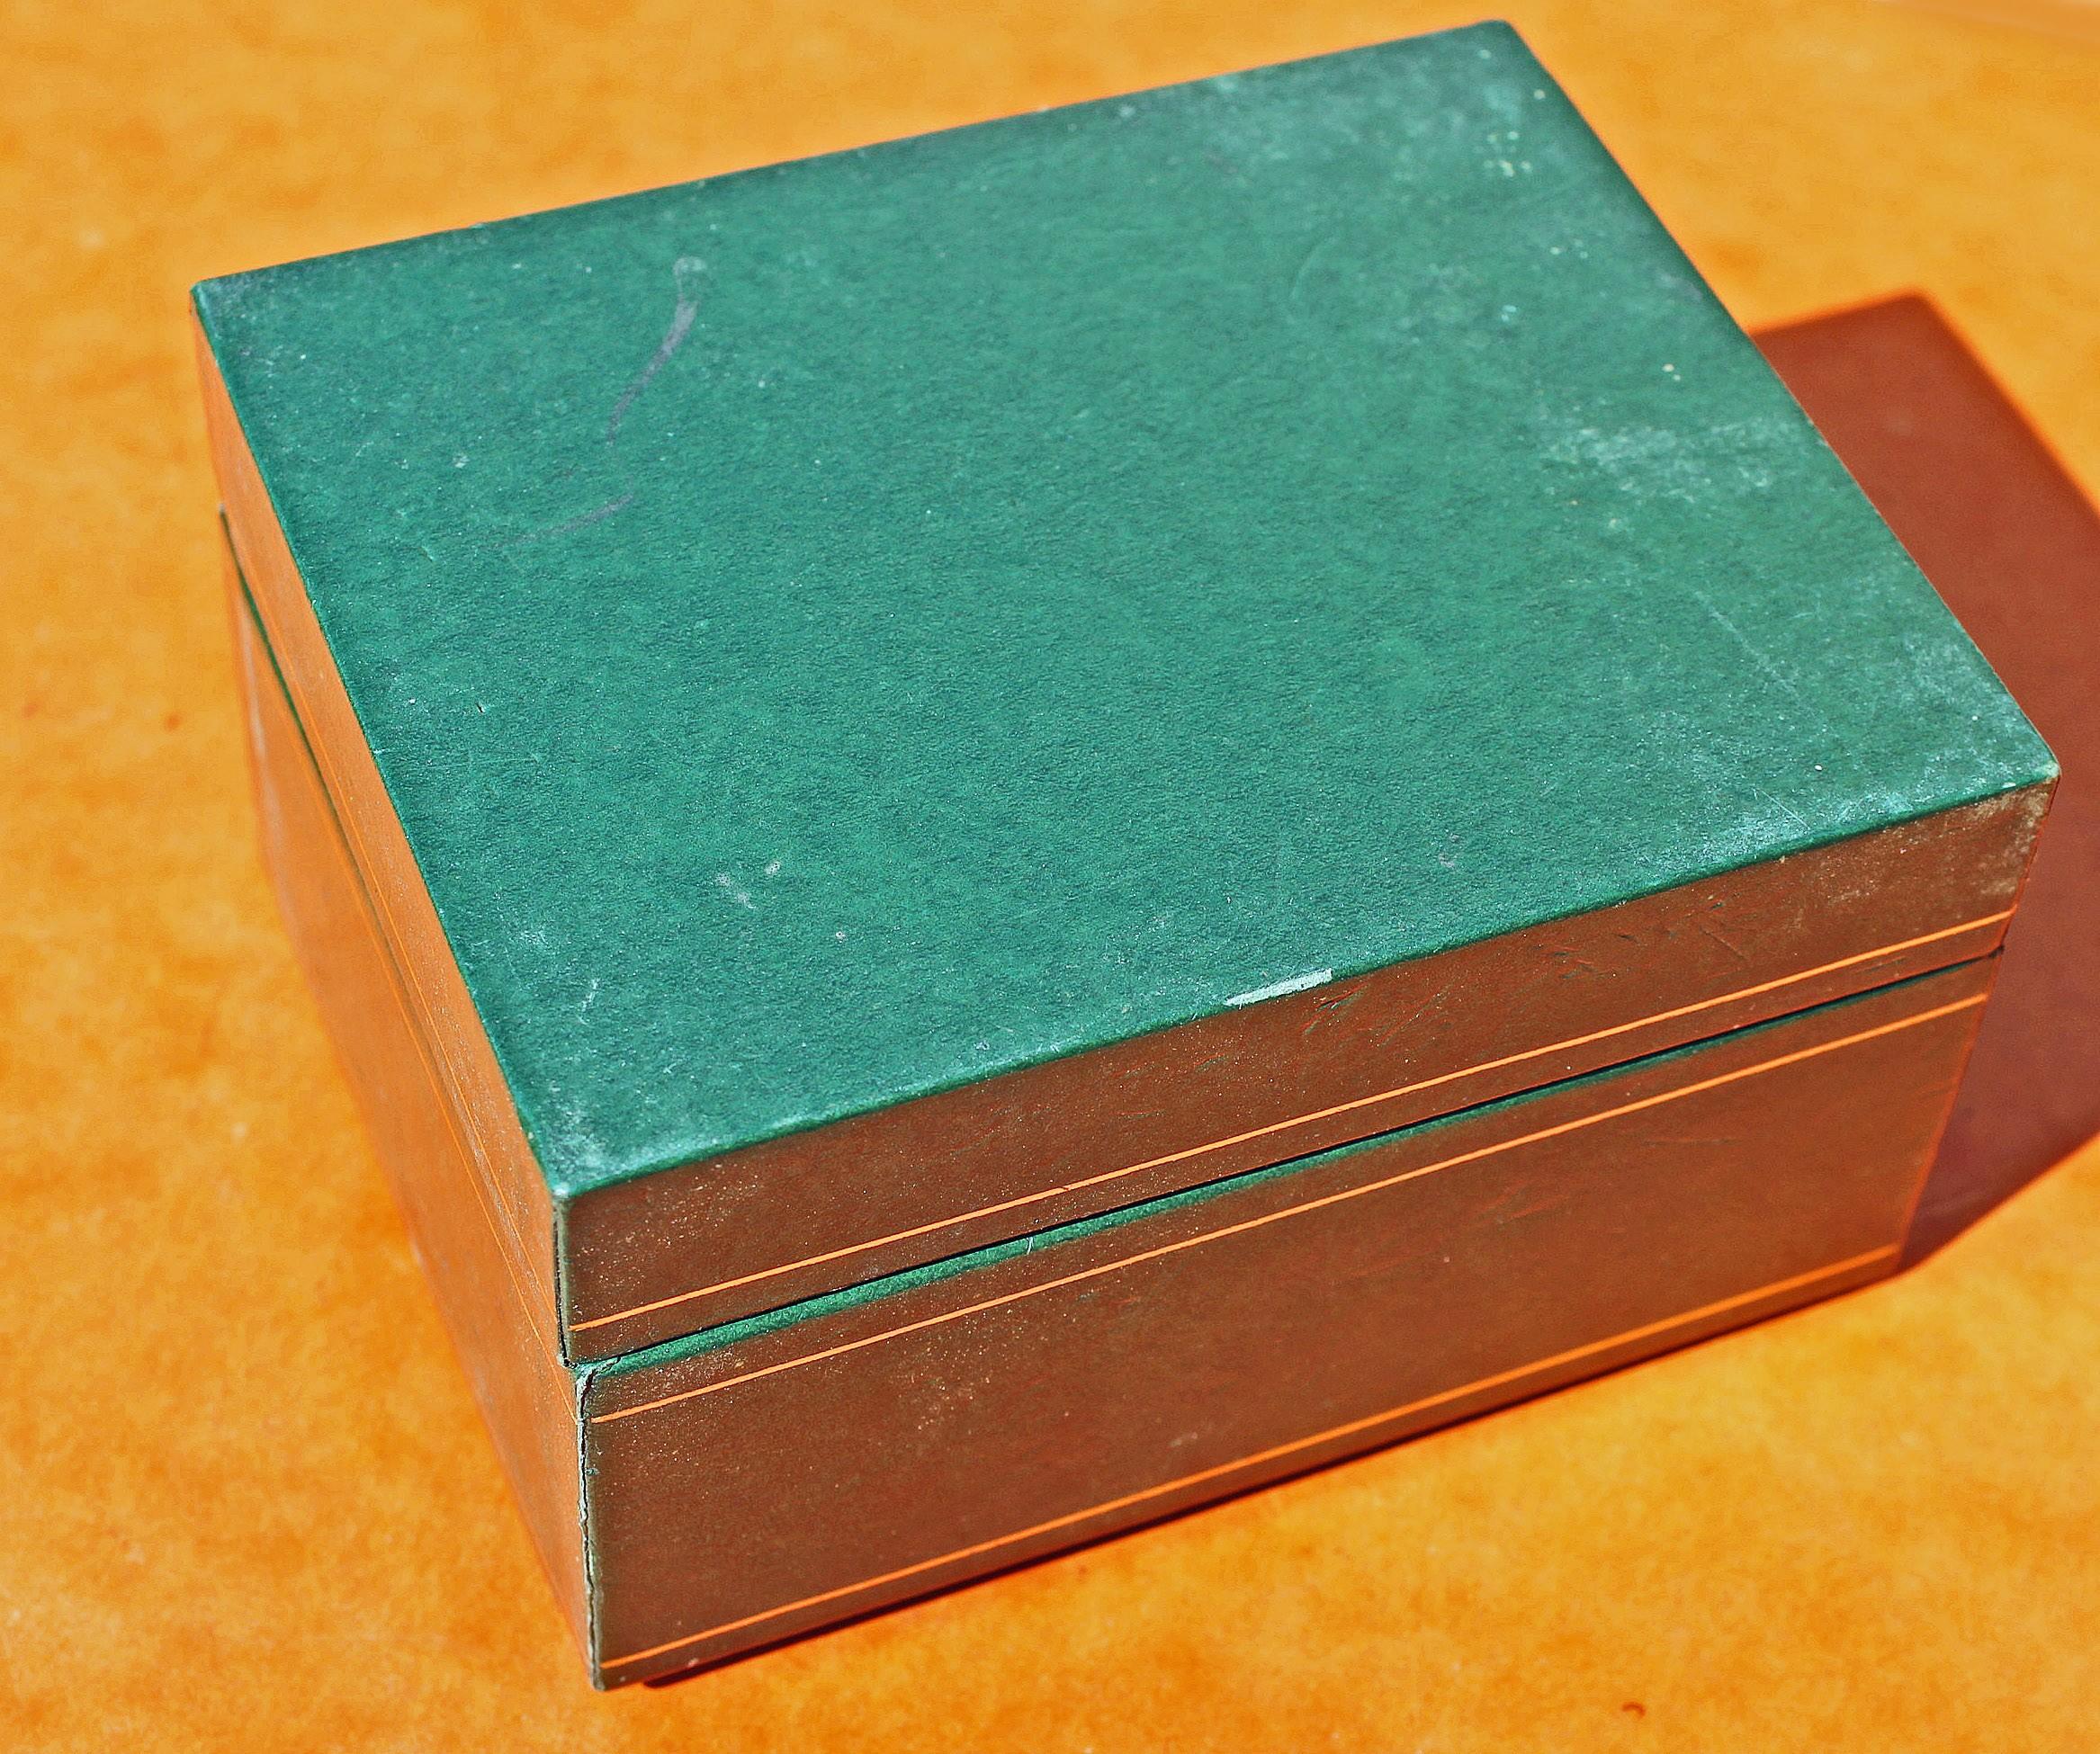 COLLECTIBLE VINTAGE RADO WATCH BOXSET 60's GREEN LEATHER STORAGE CASE WATCHES